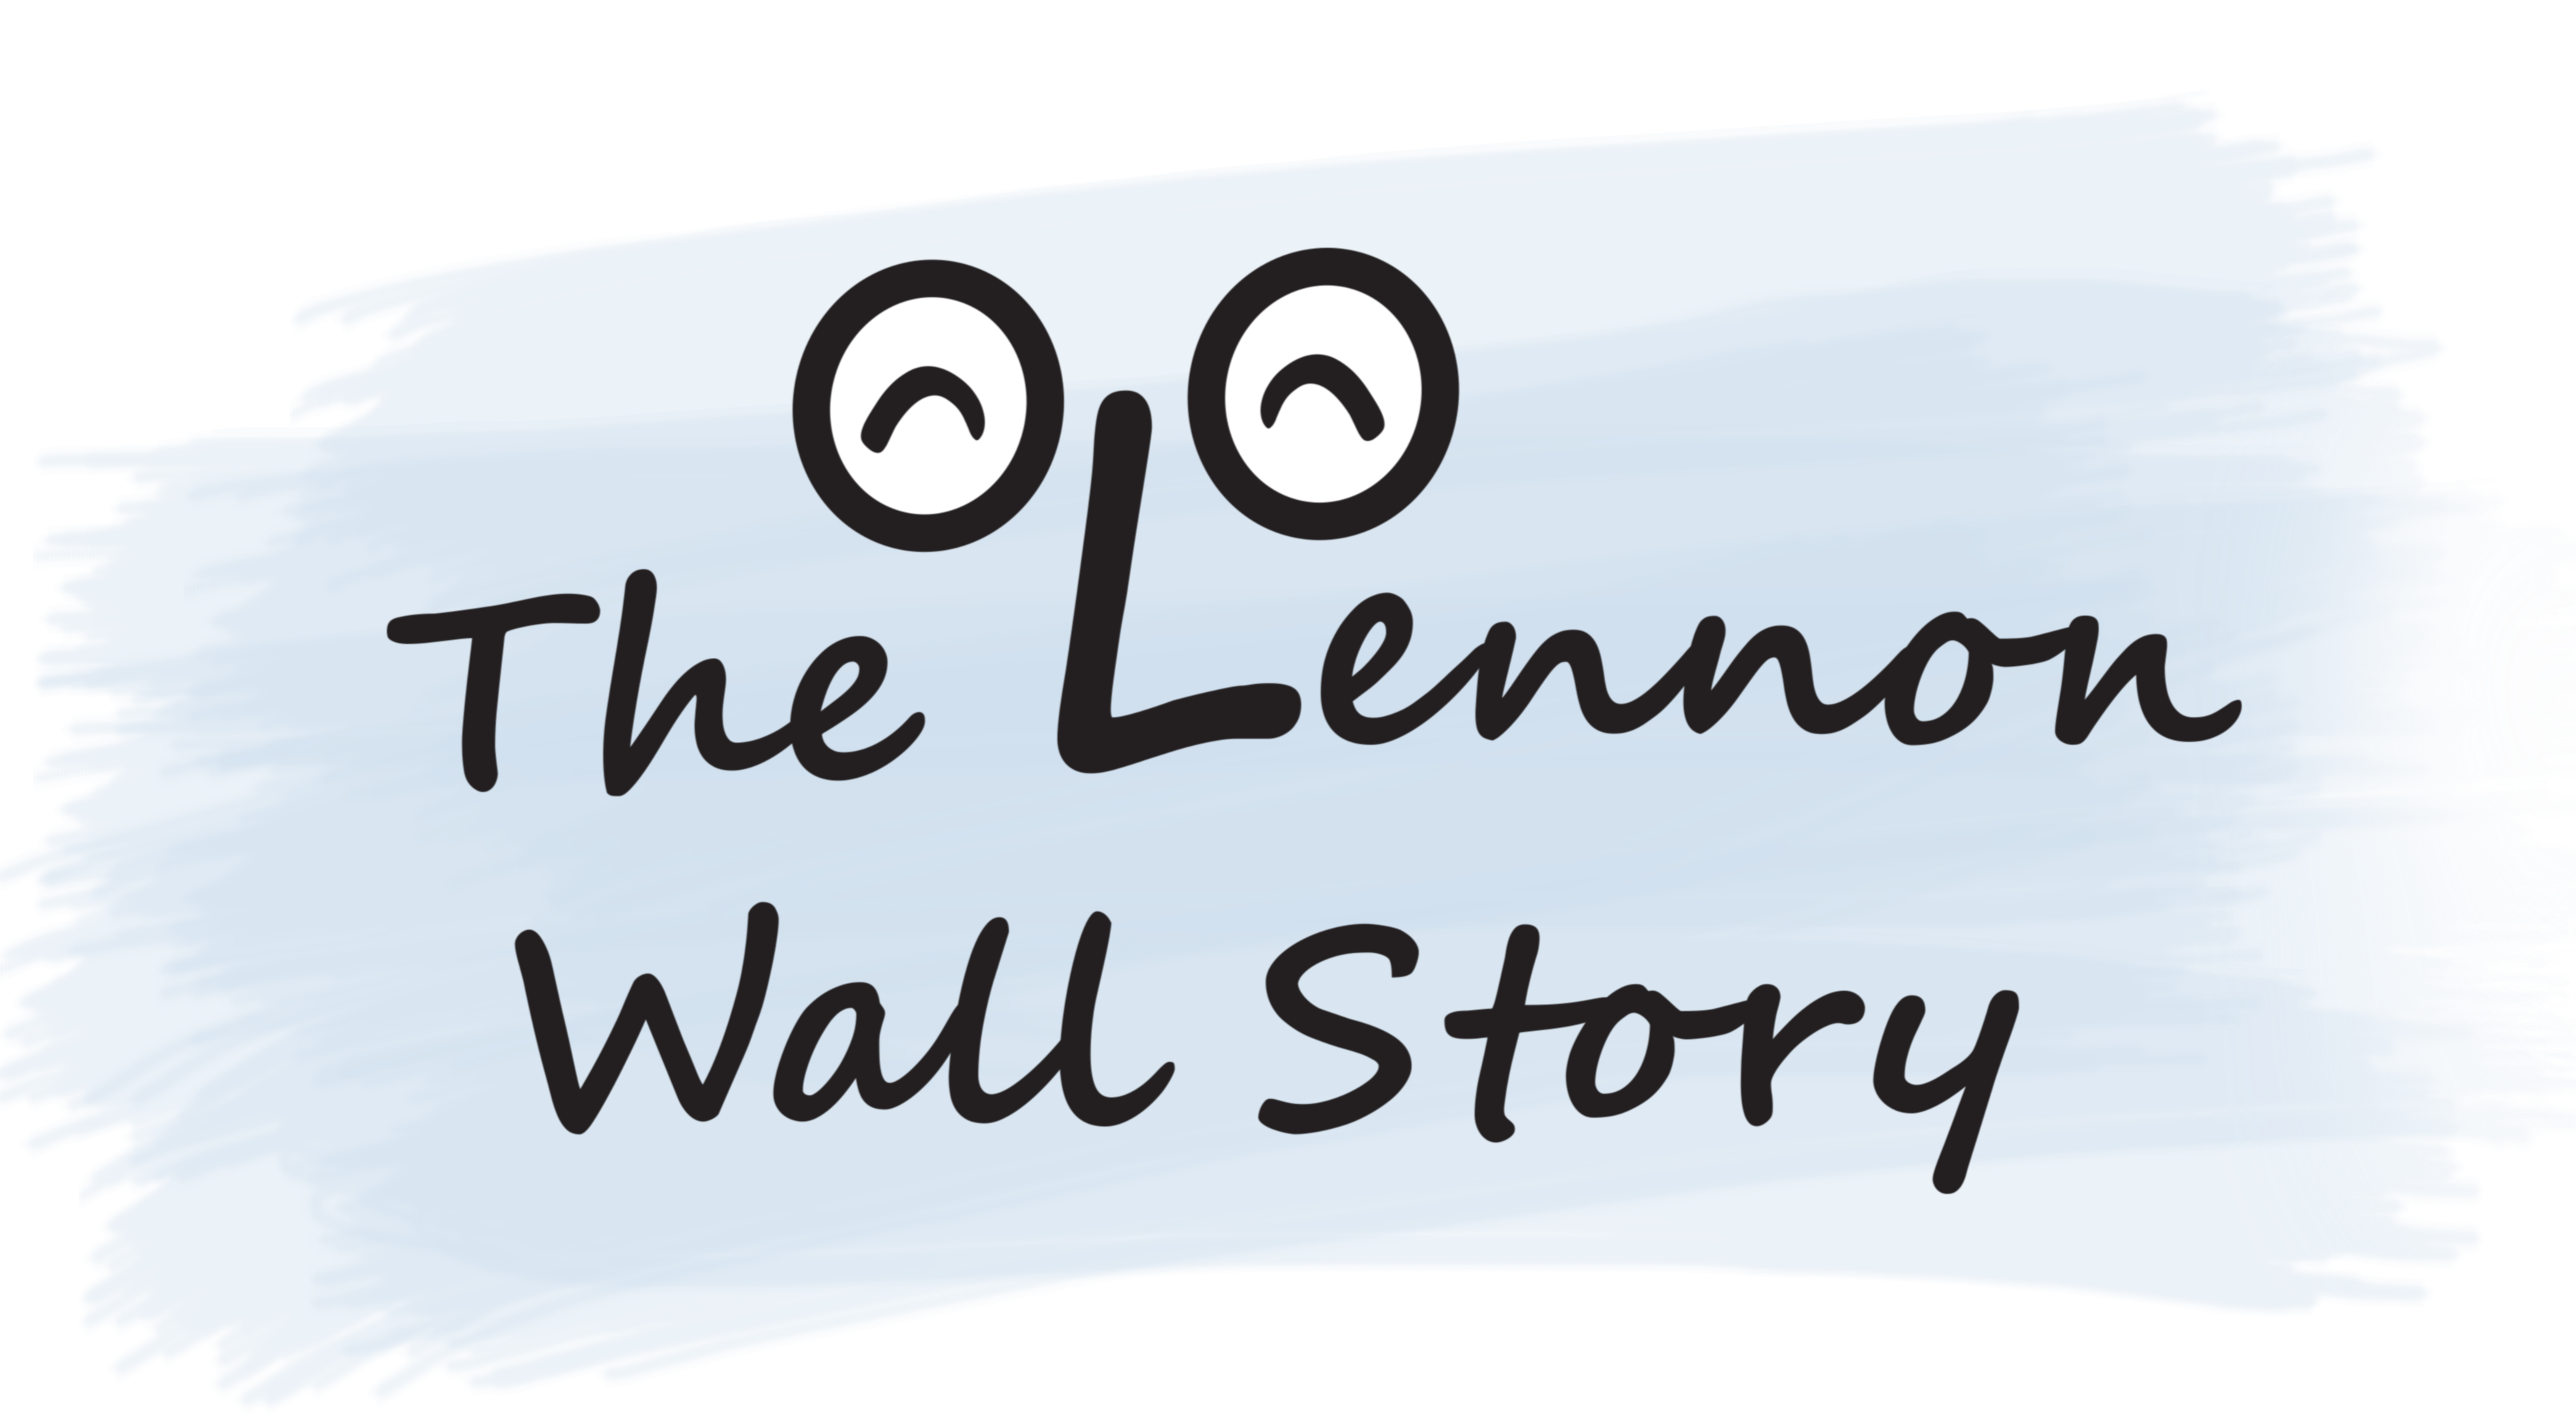 The Lennon Wall Story